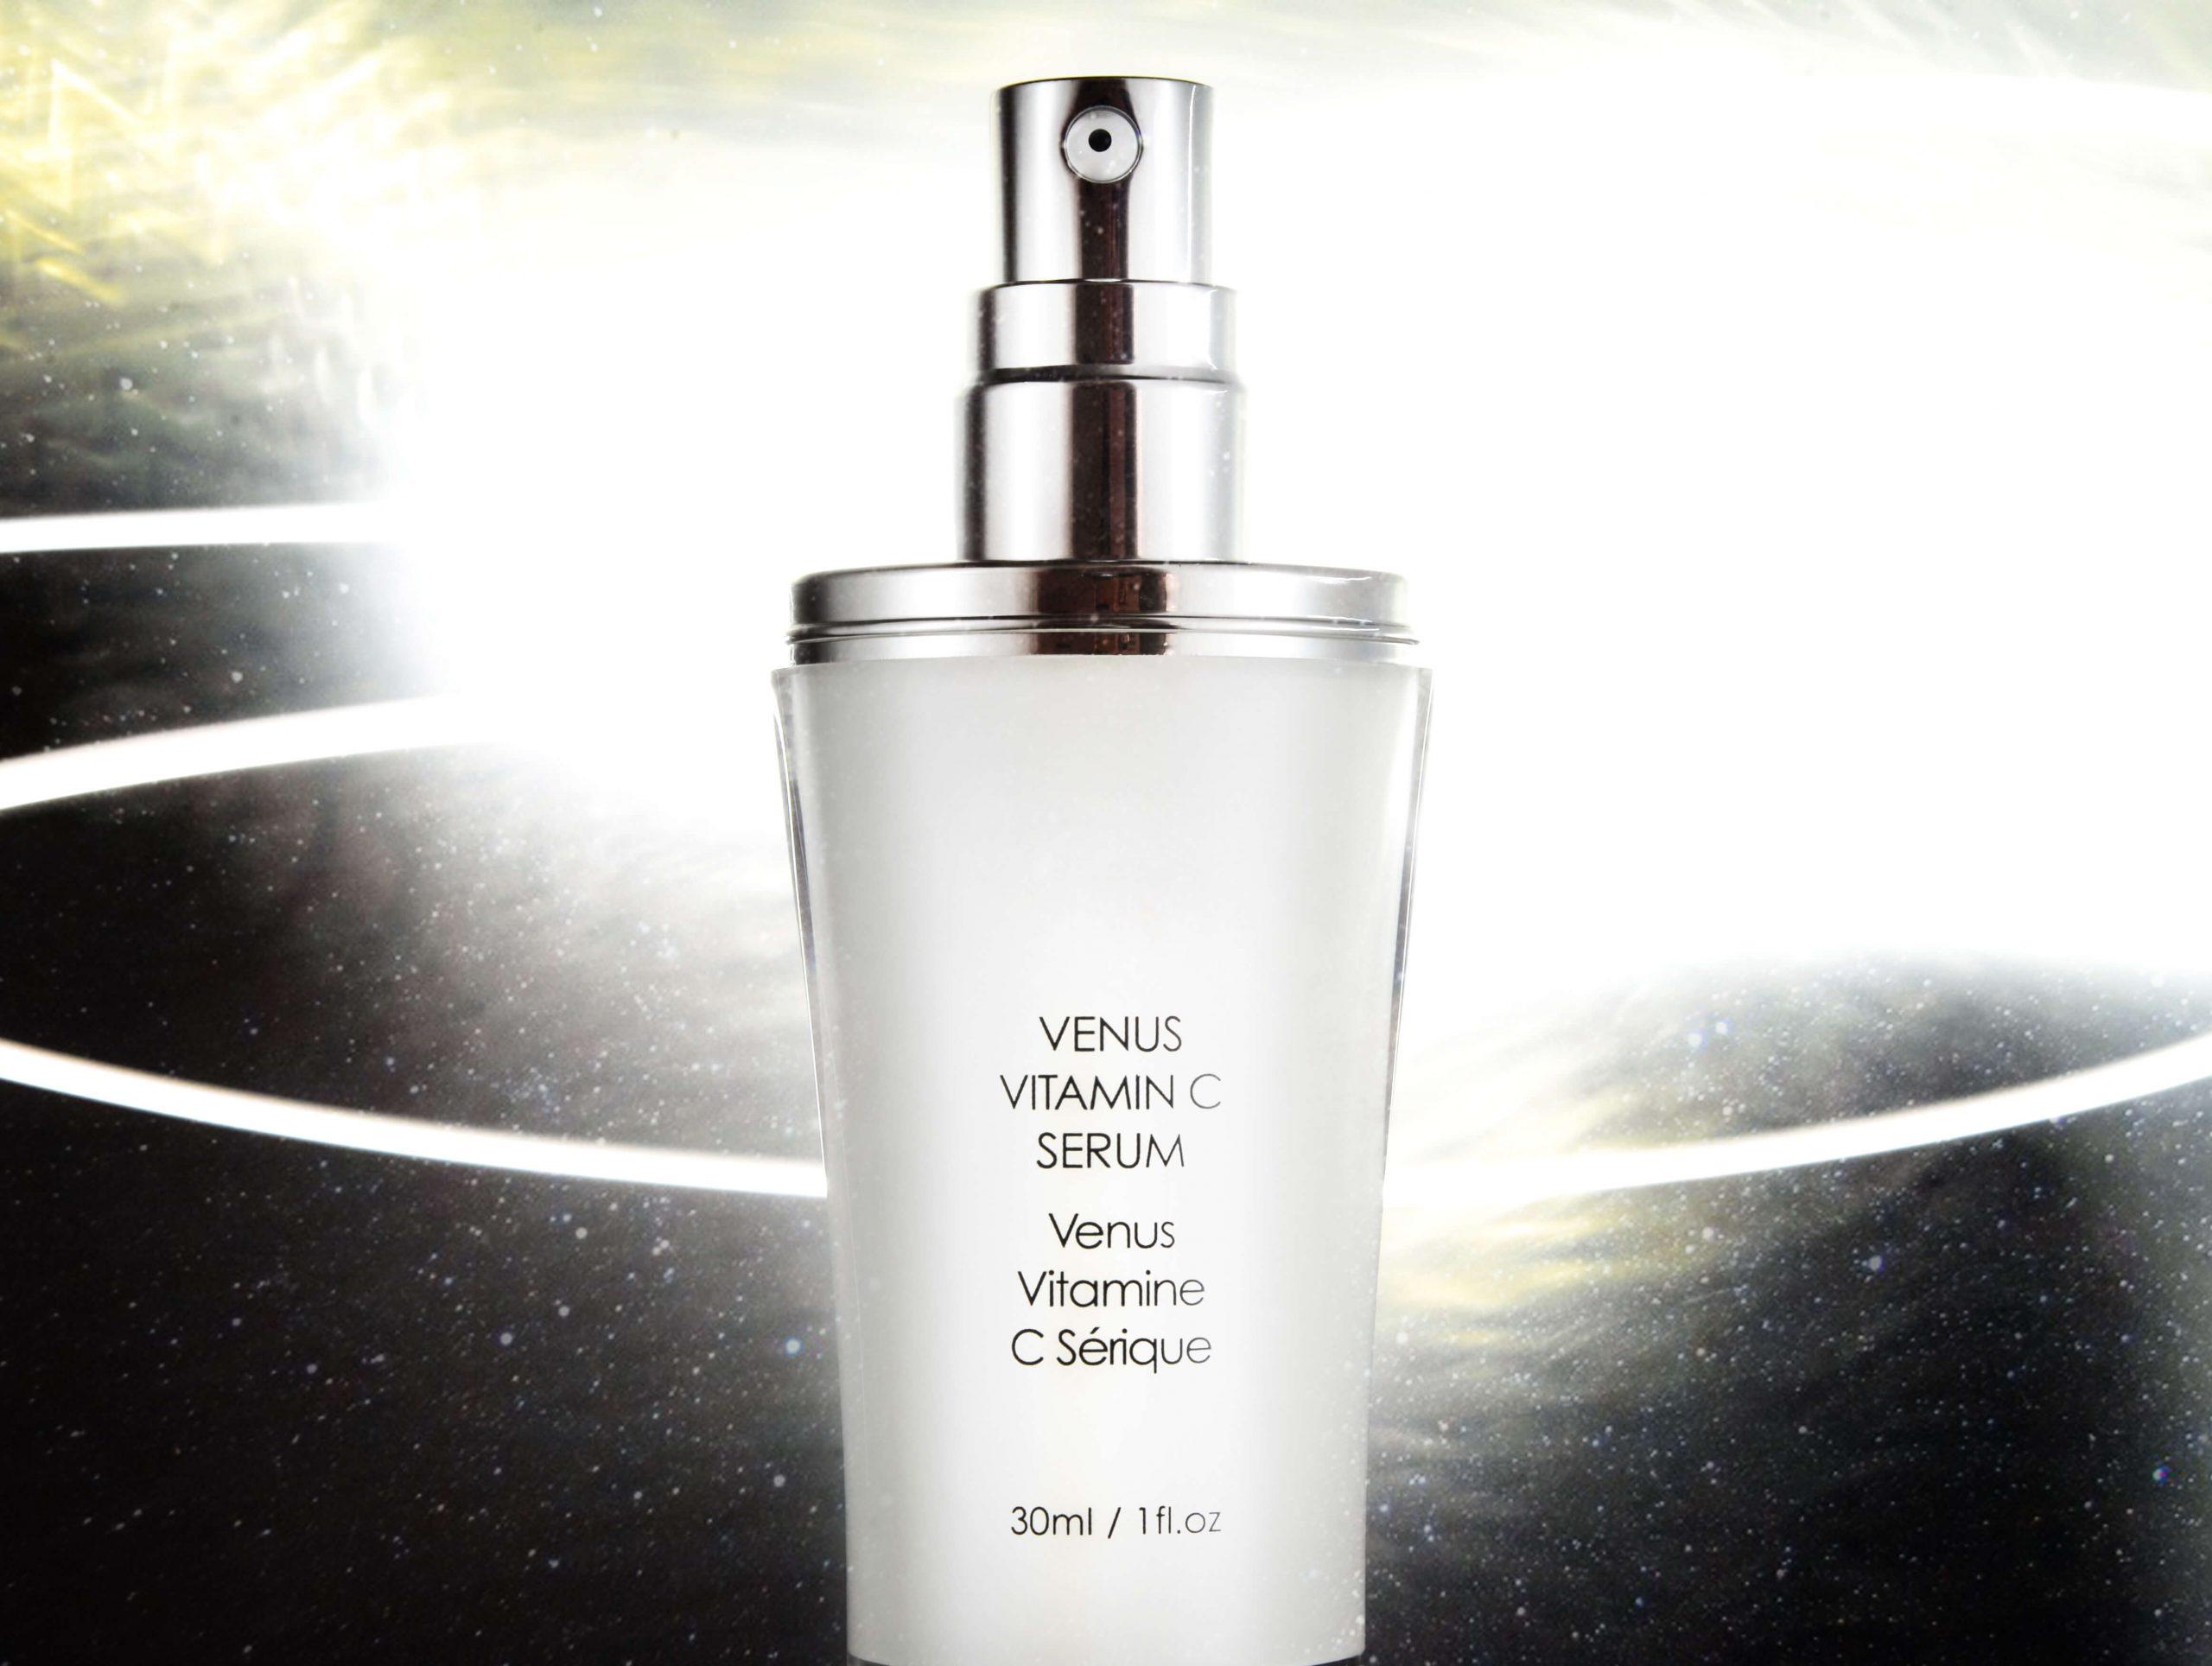 Venus Vitamin C Serum from Celestolite